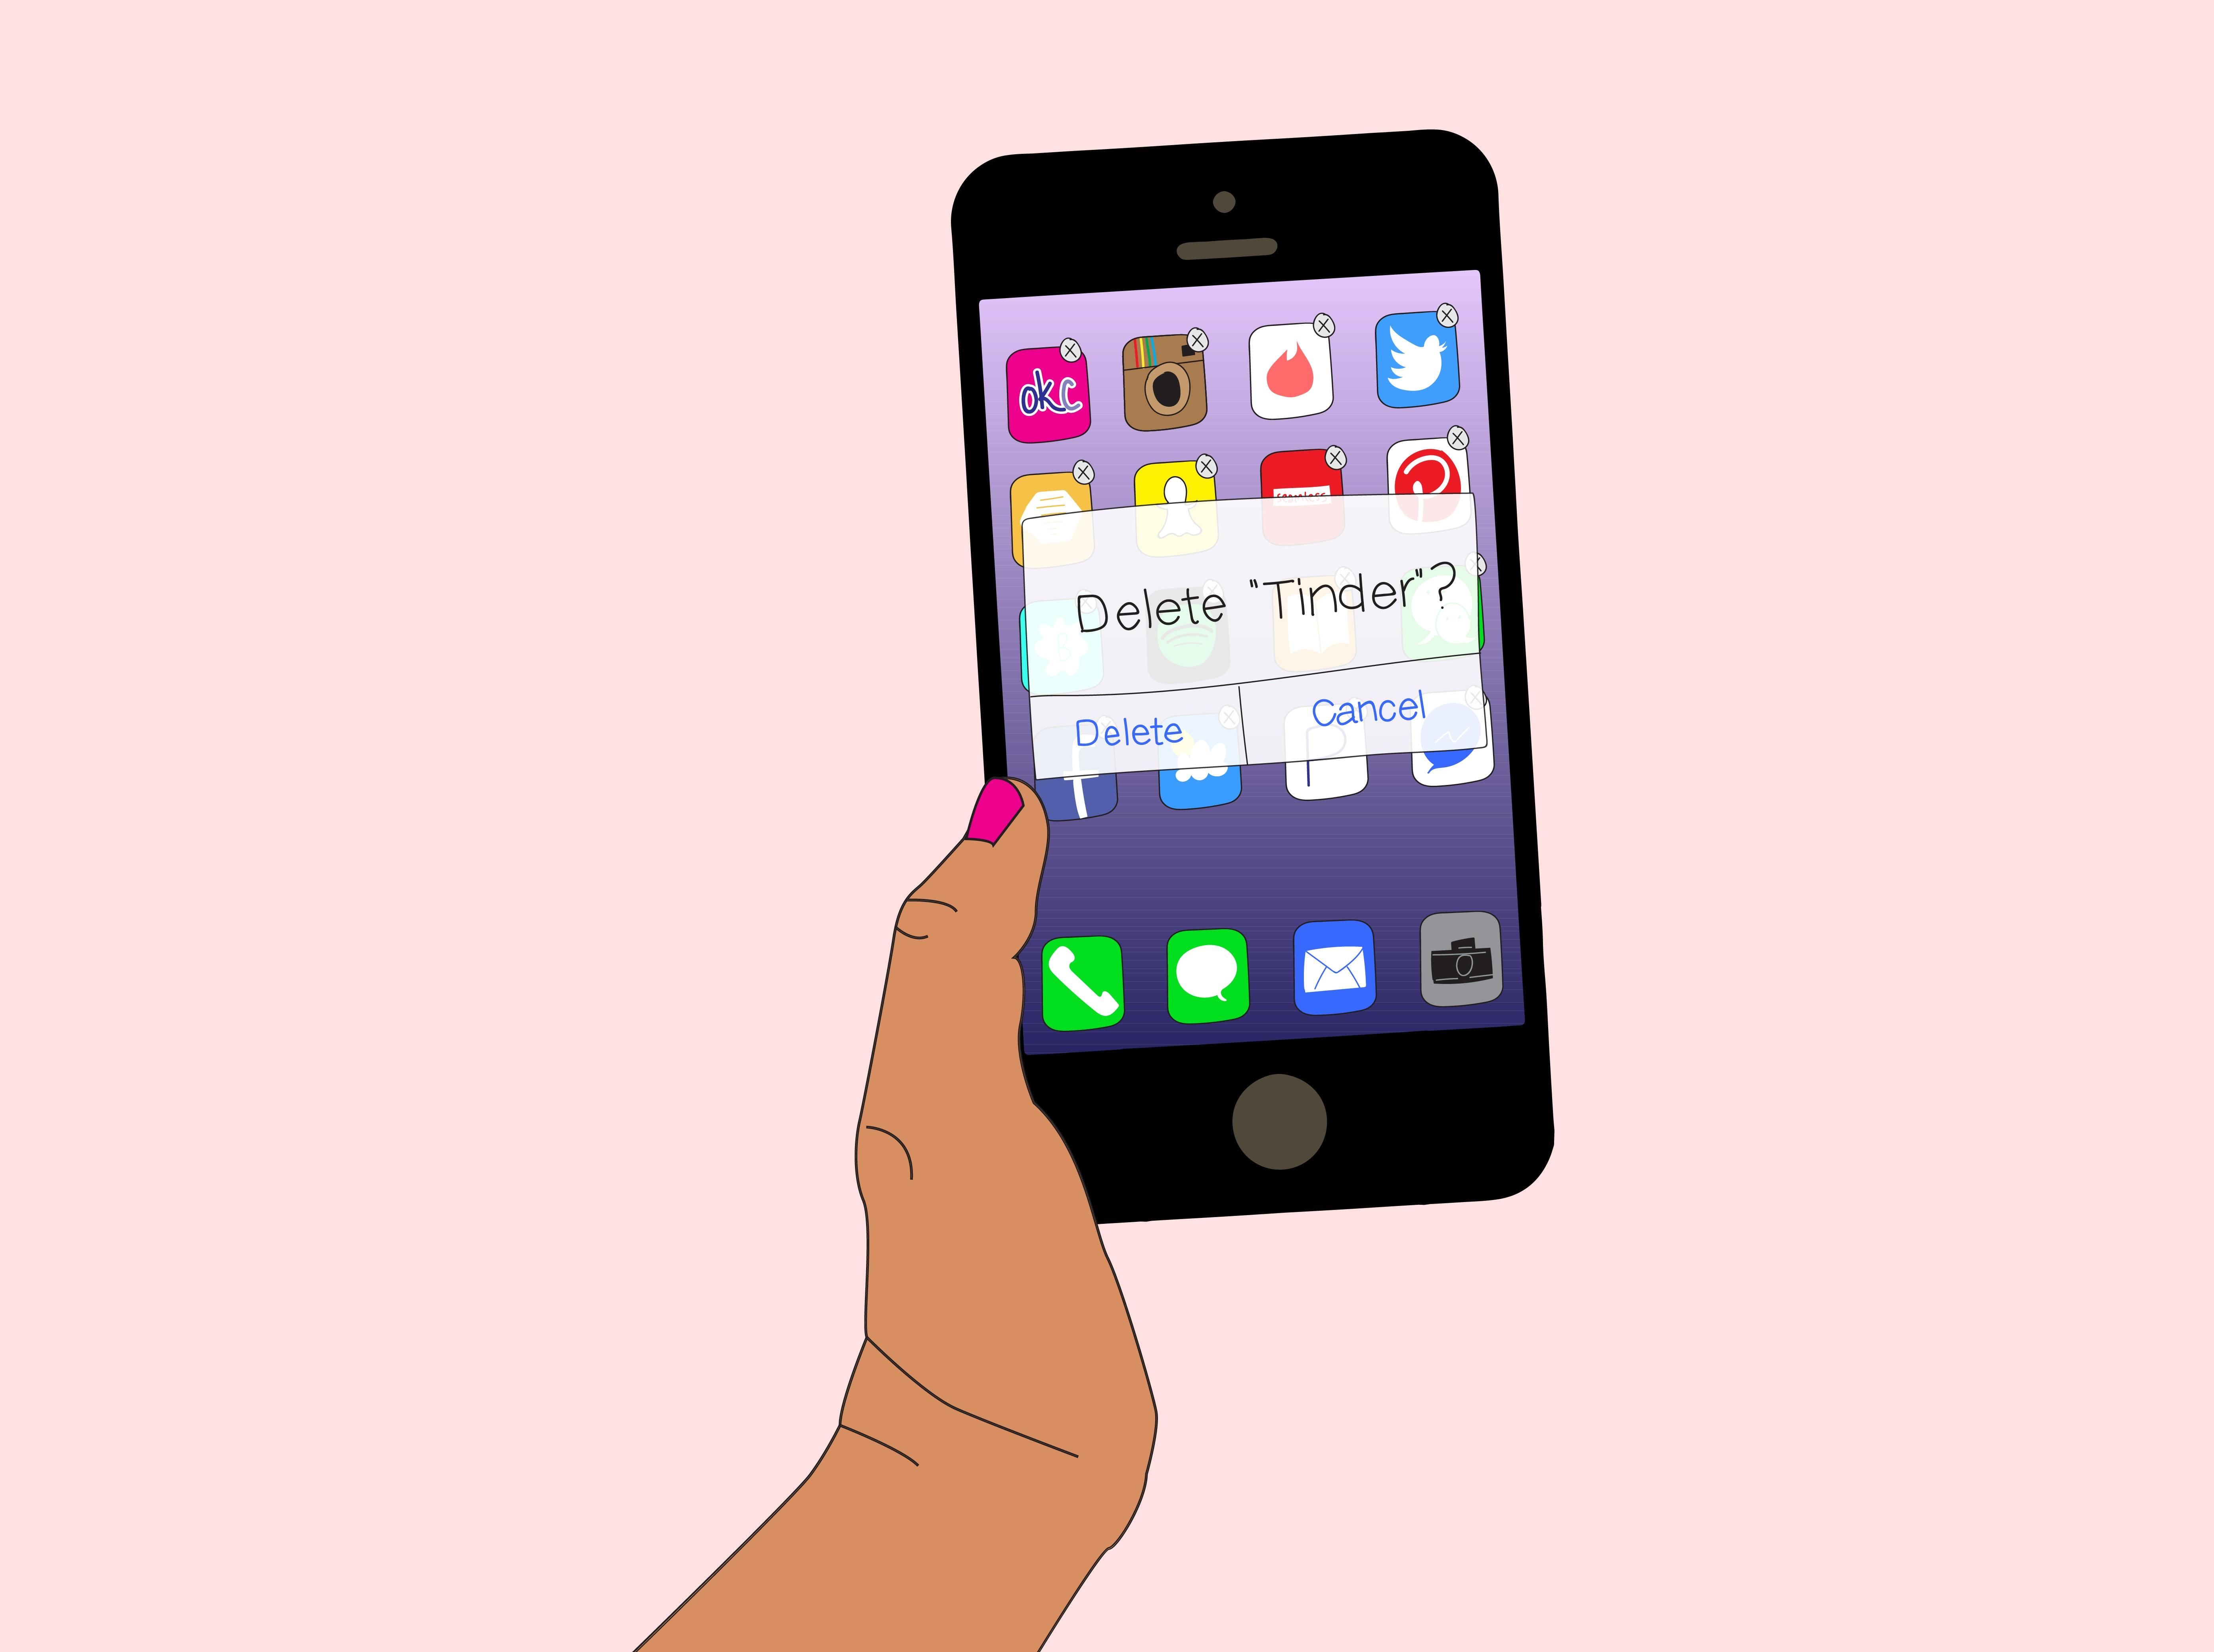 dating apps make me feel bad